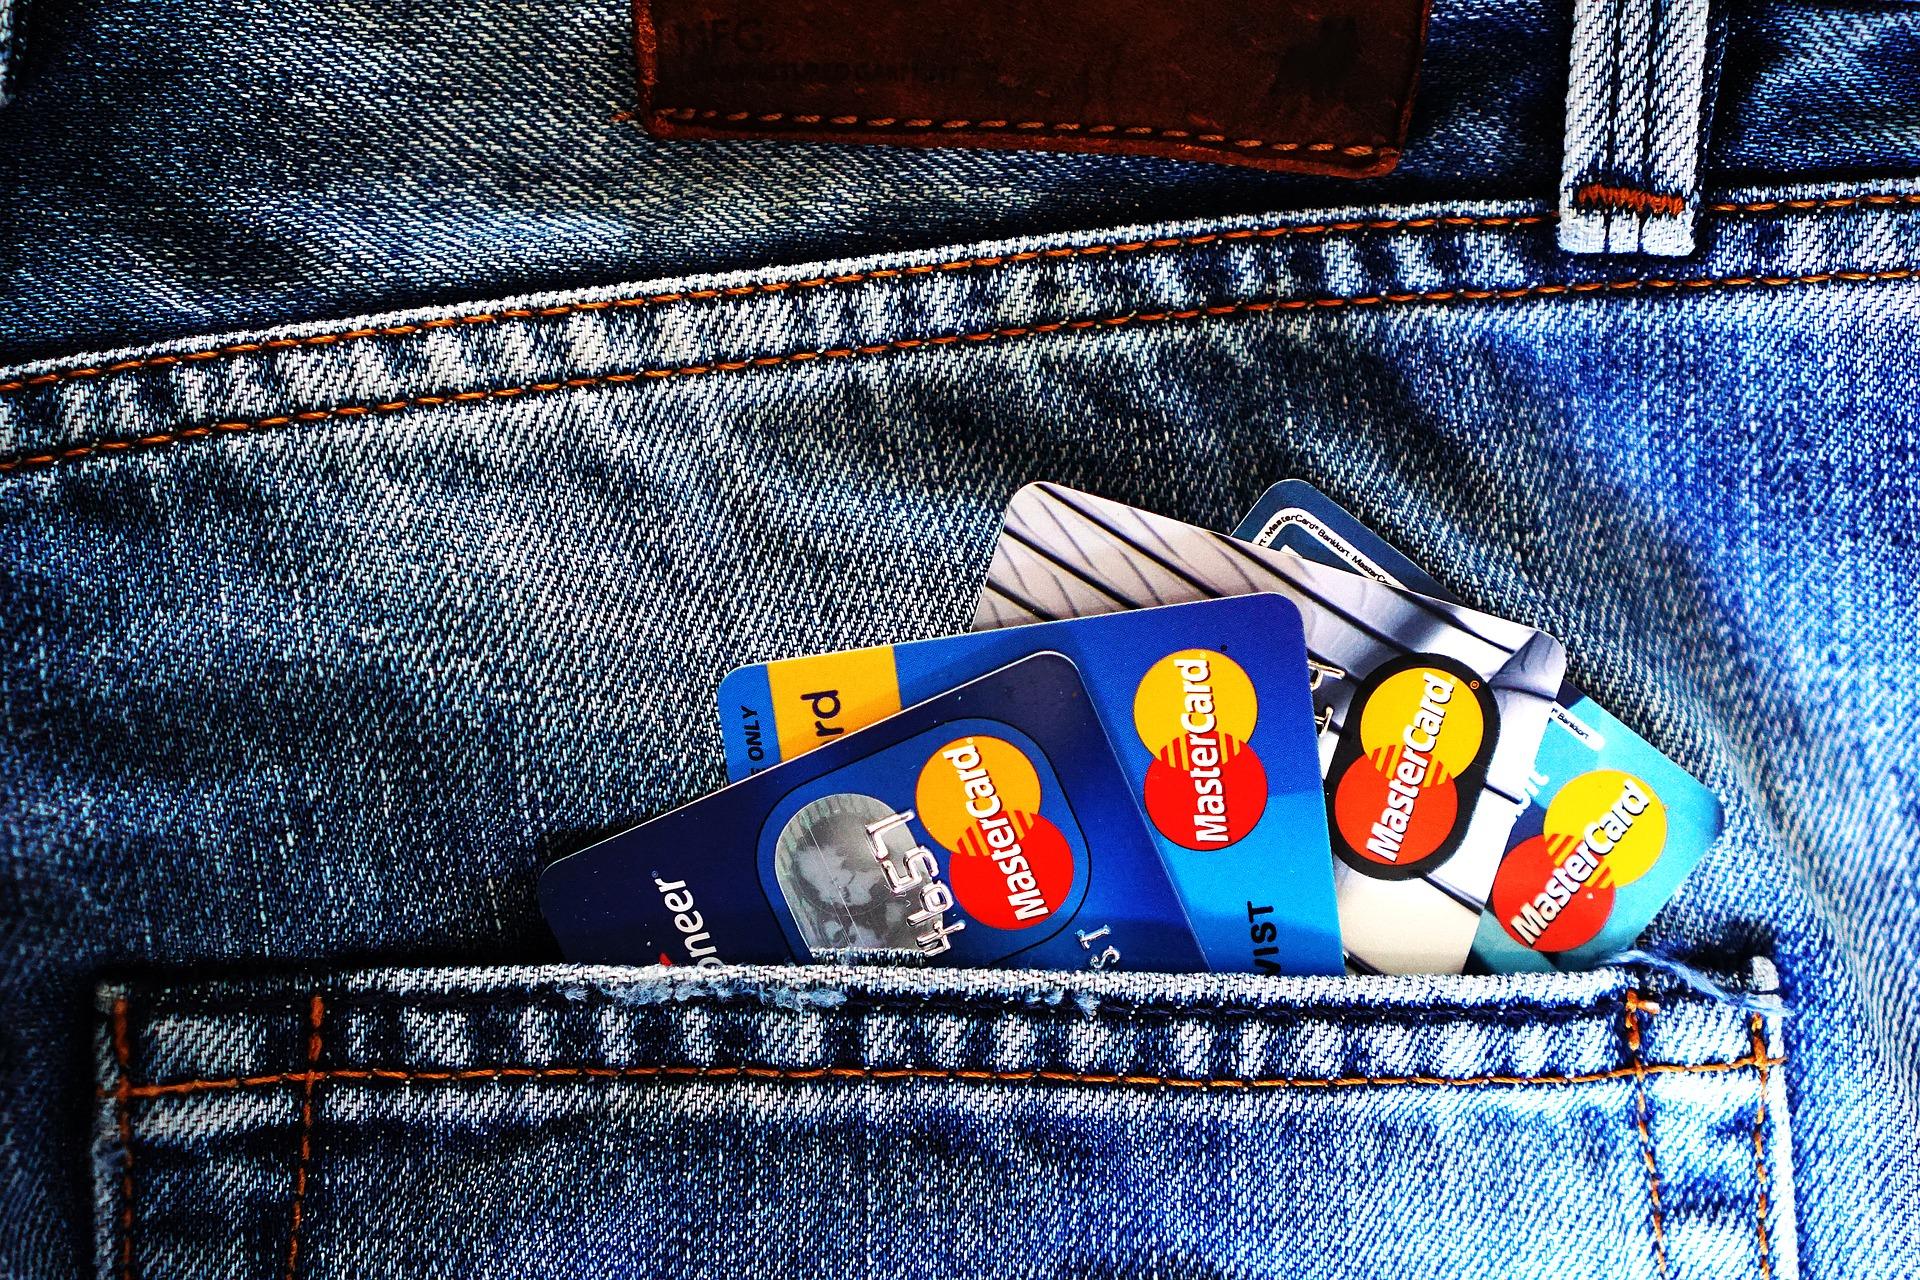 credit-card-1583534_1920.jpg